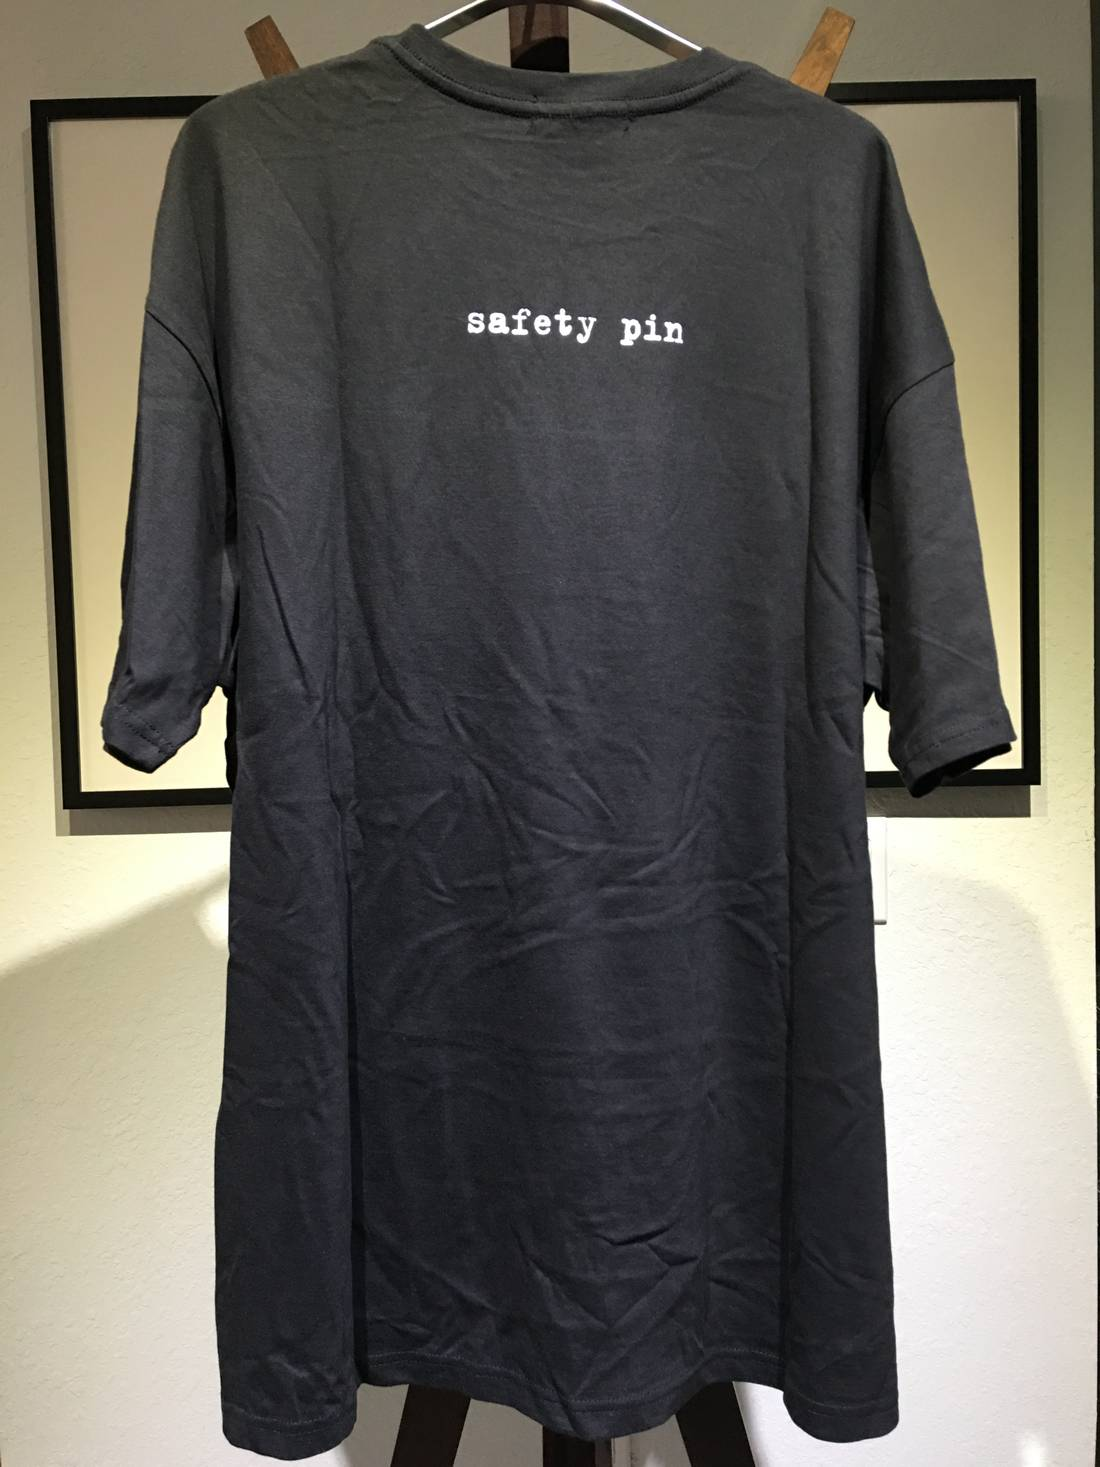 Black light t shirt ideas -  Midnight Studios Bring New Ideas To Light T Shirt Size Us M Eu 48